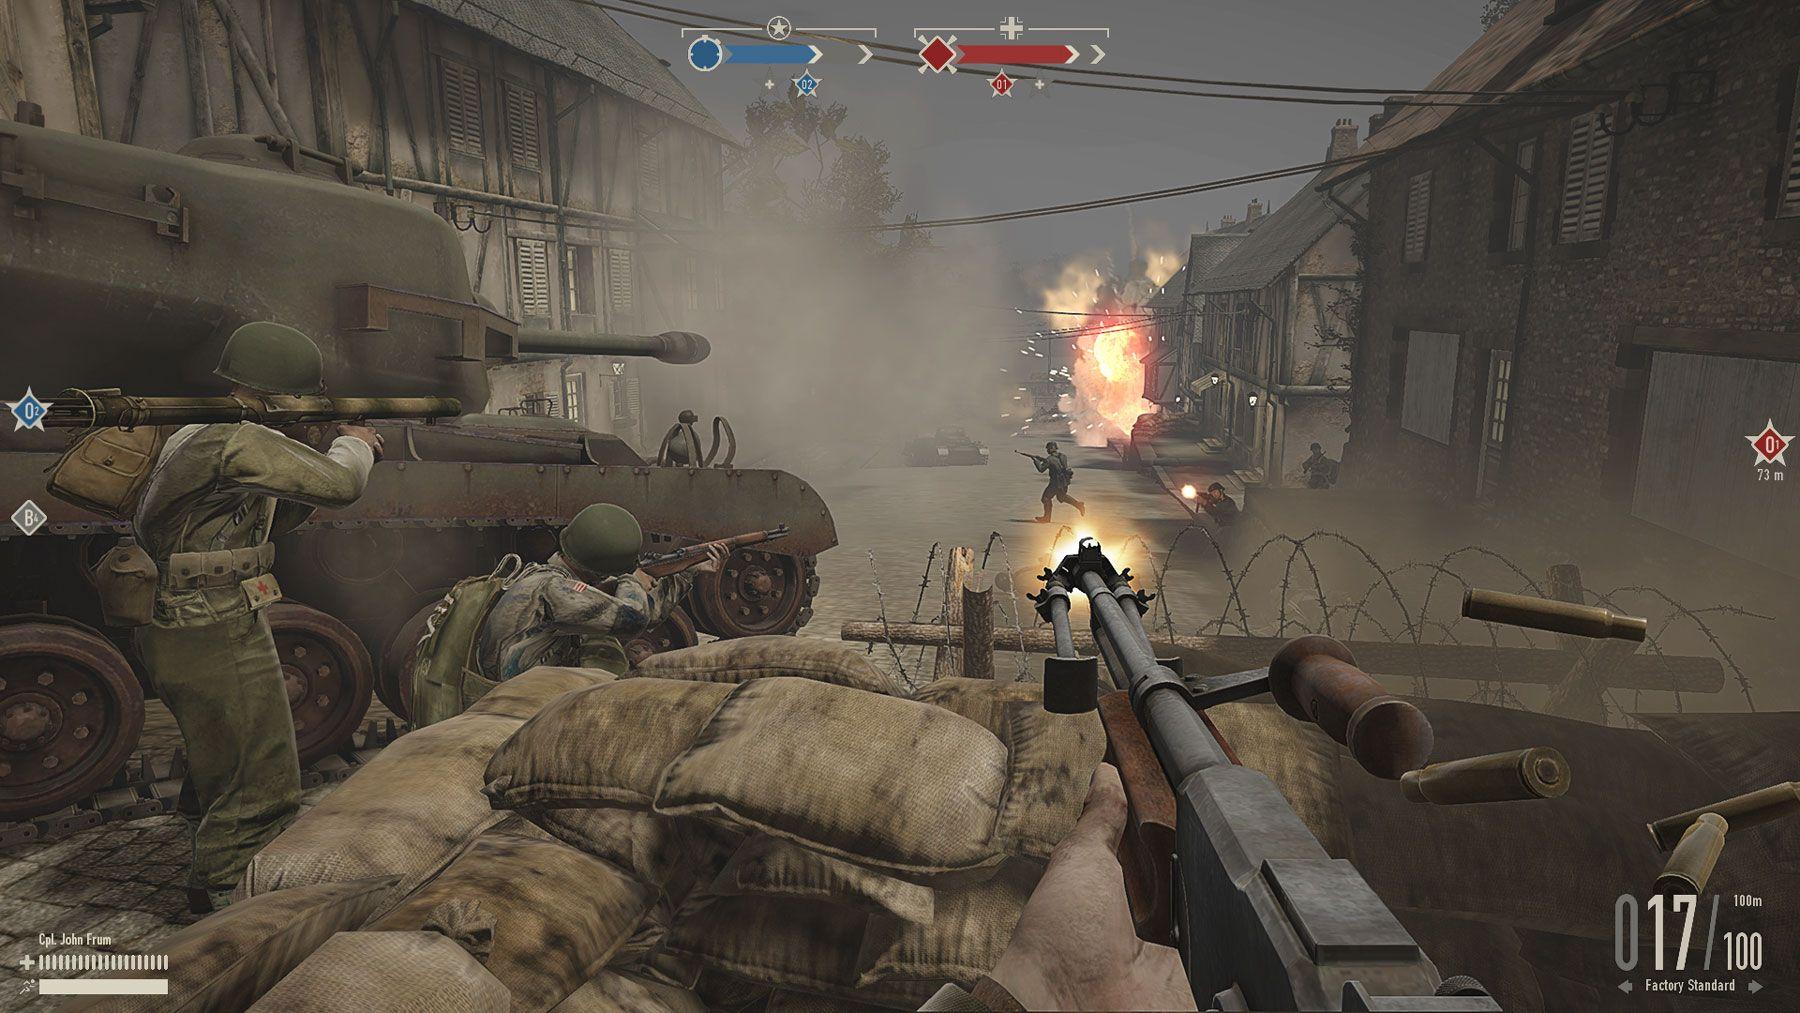 MultiplayerShooter on the theme of World War II